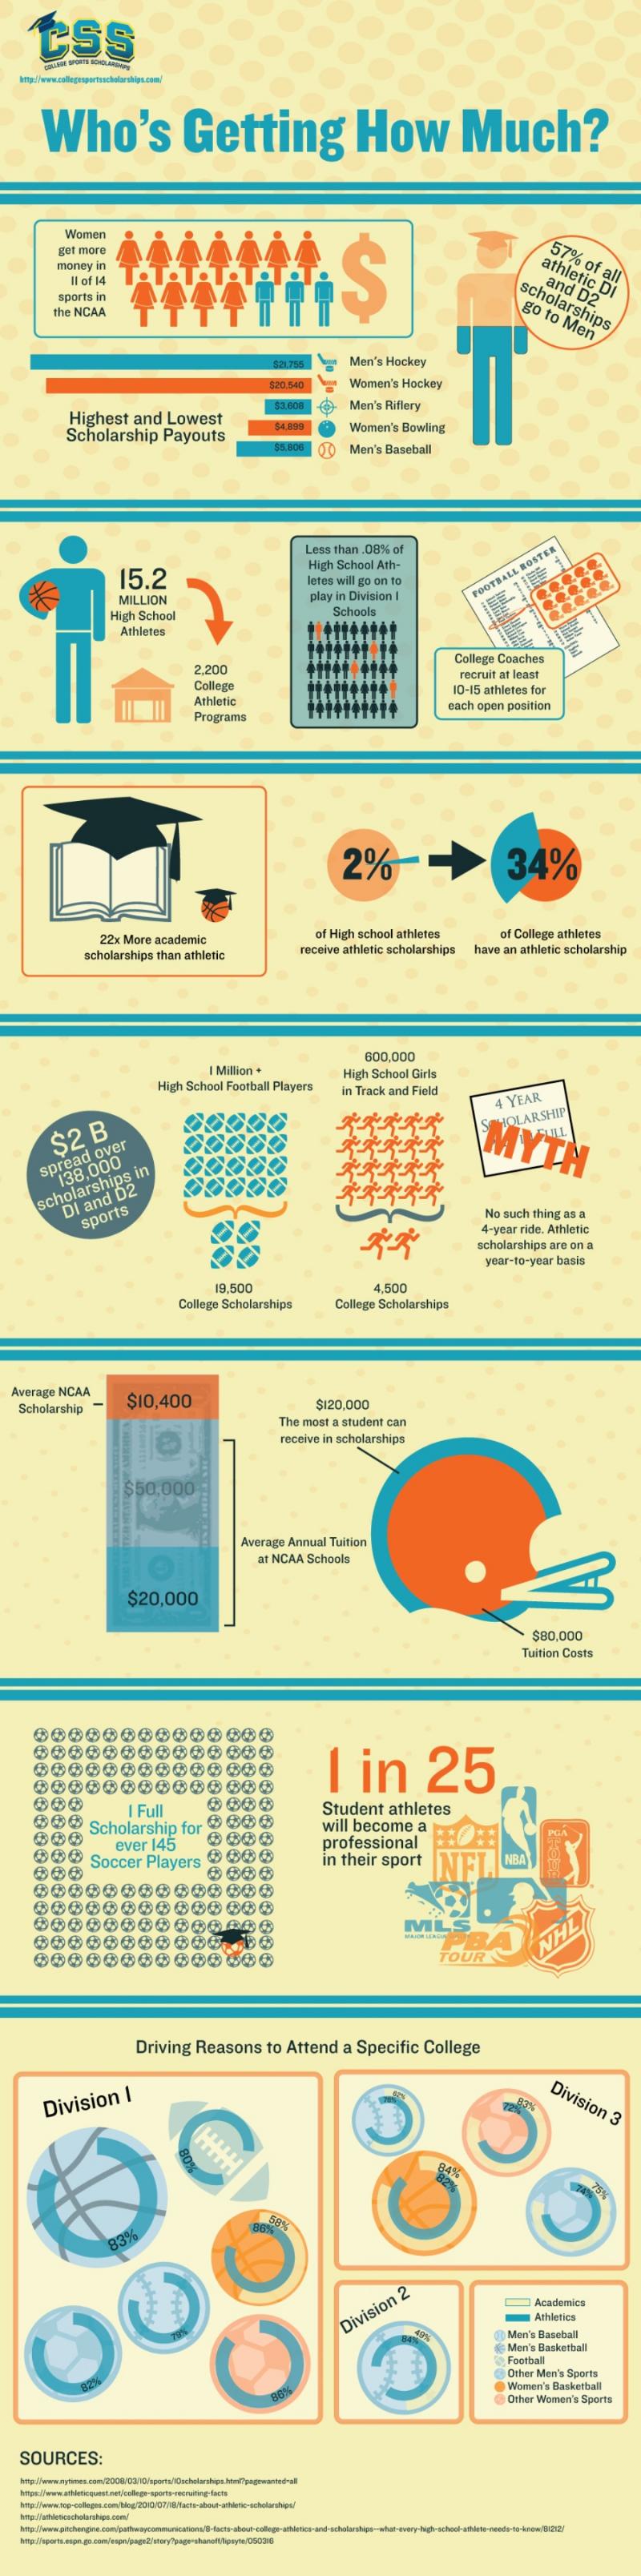 Sports Scholarship Statistics